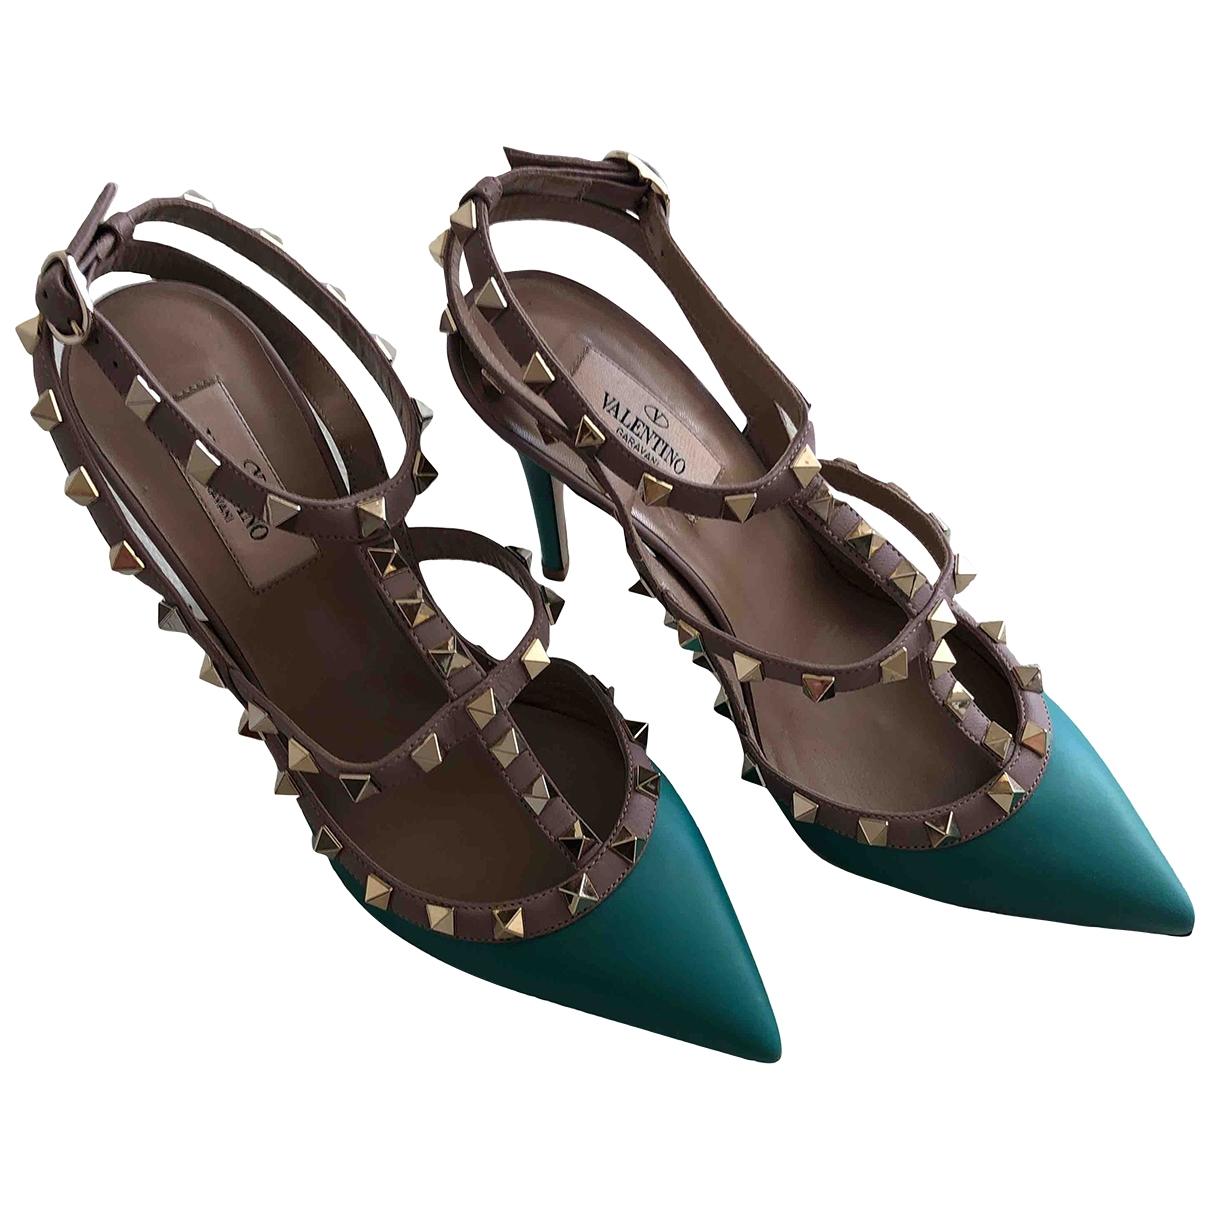 Valentino Garavani Rockstud Turquoise Leather Heels for Women 38.5 EU